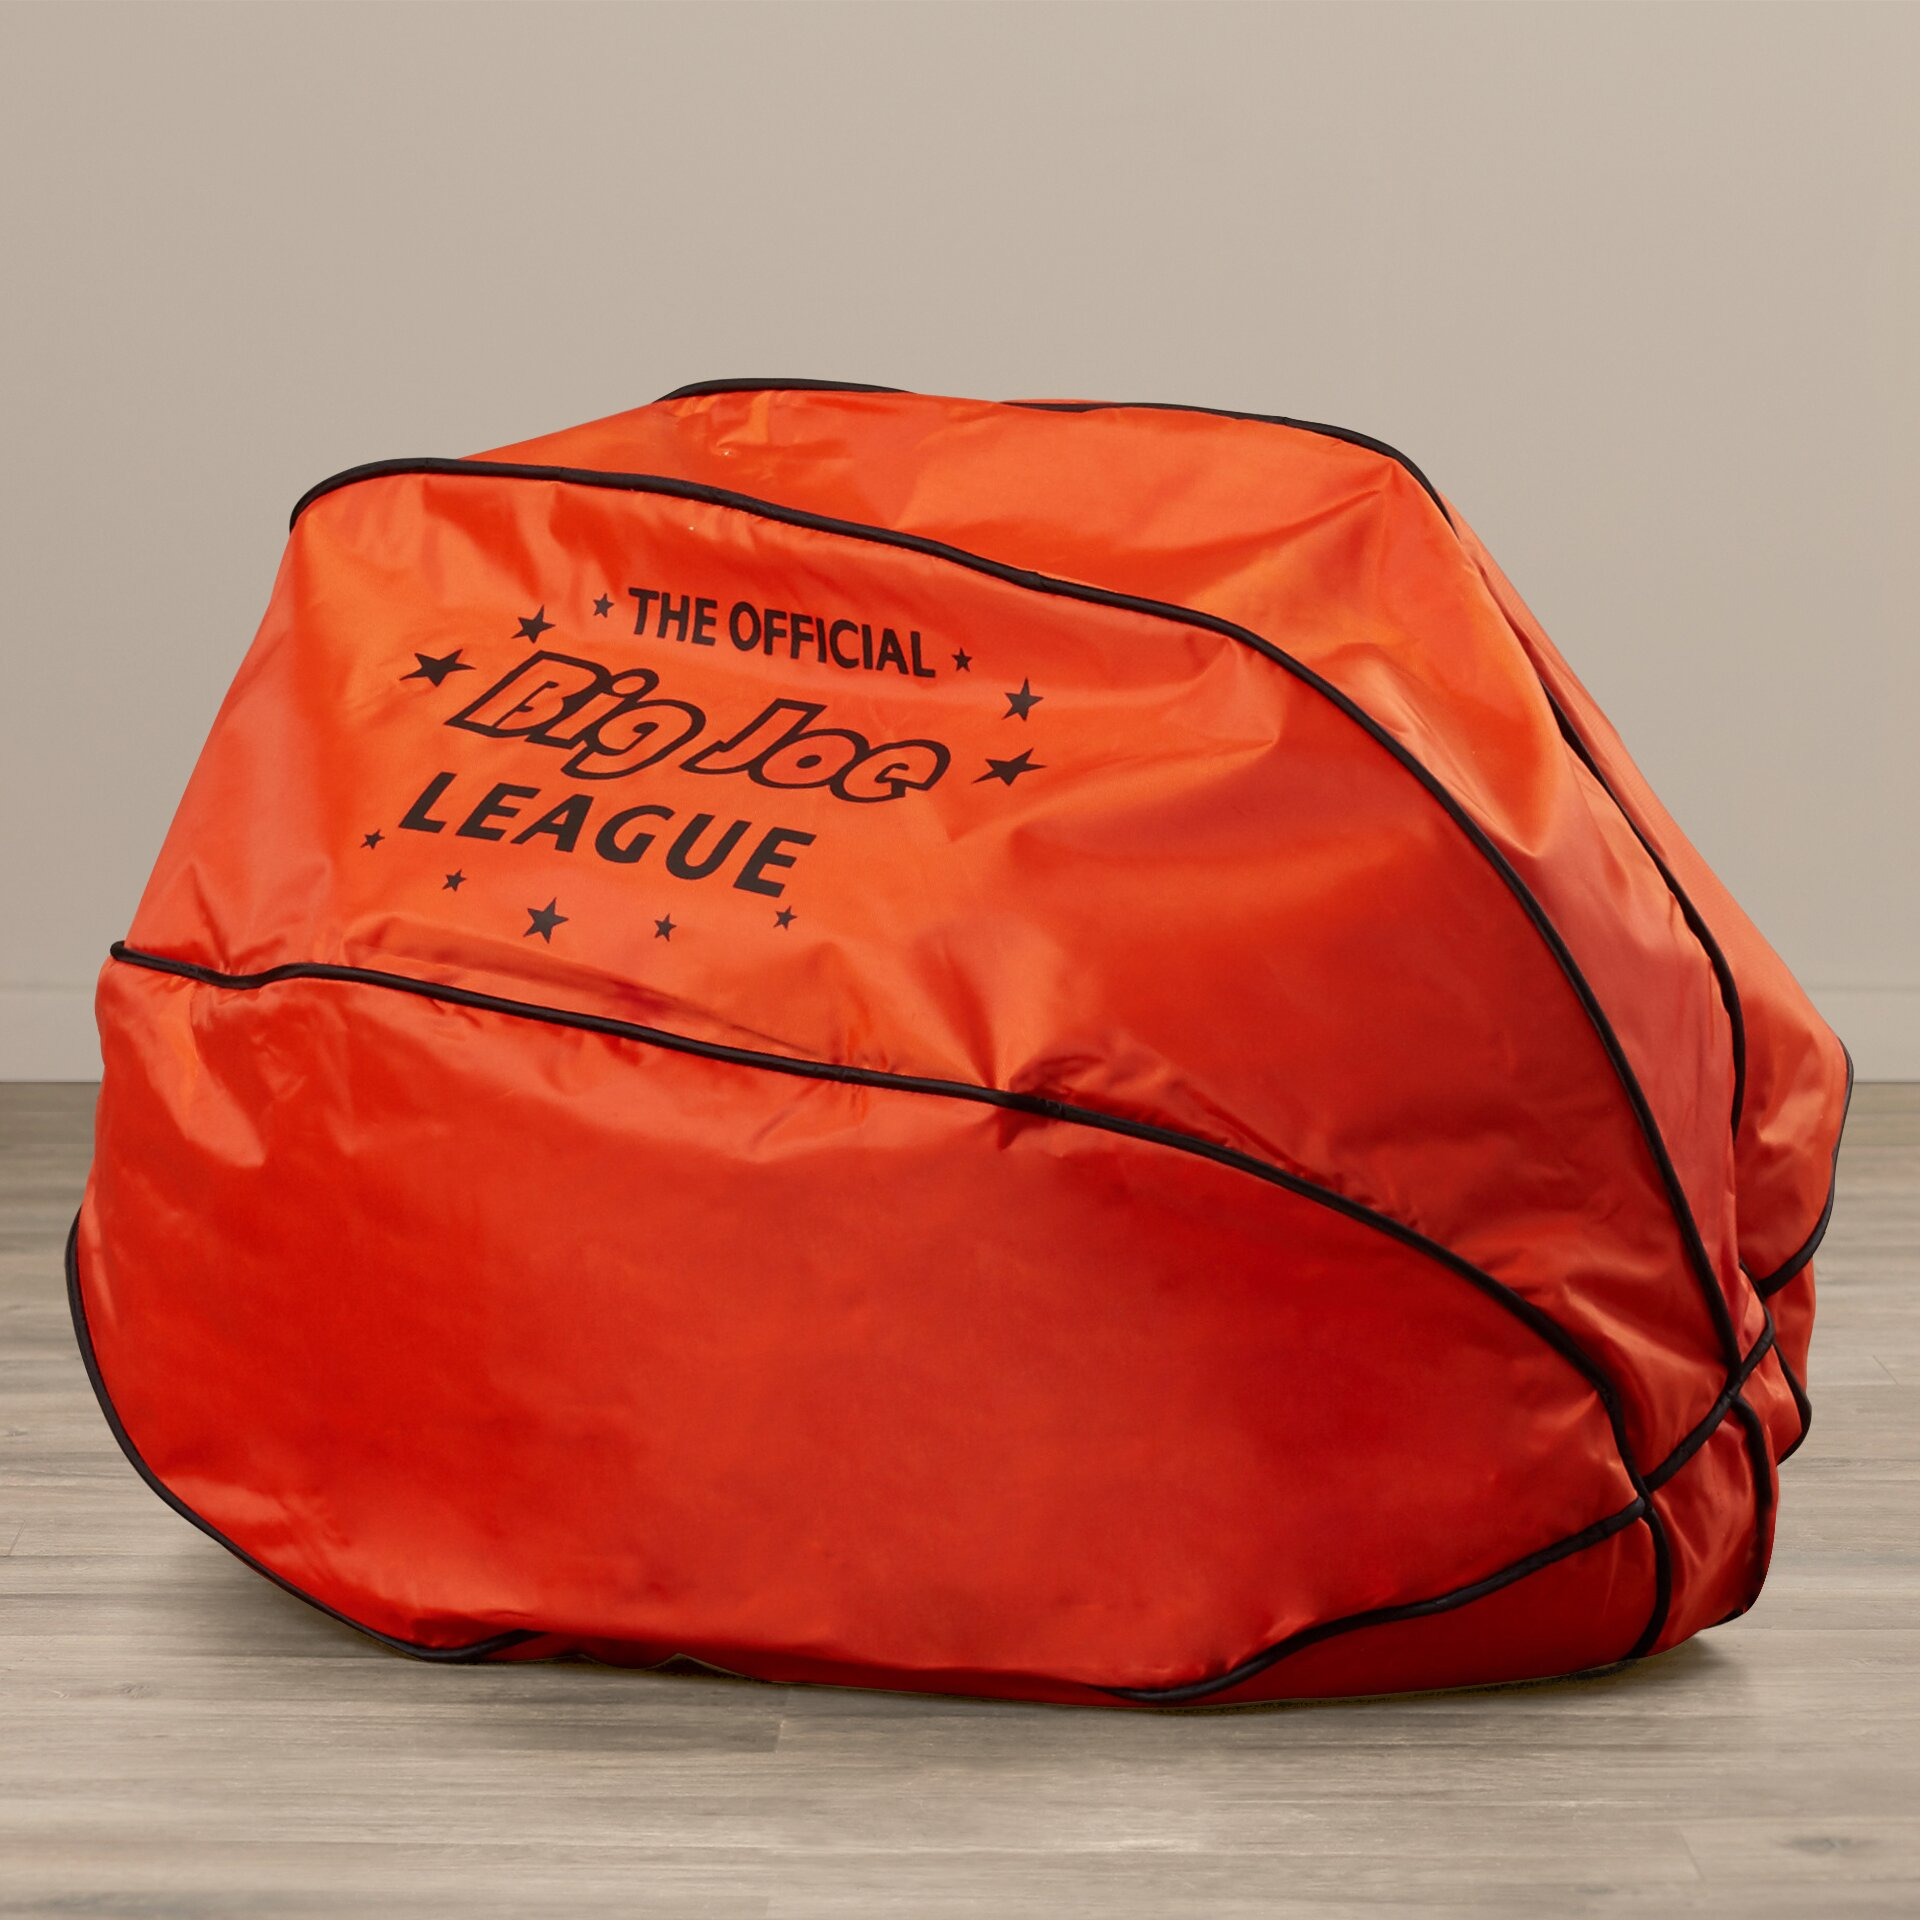 Comfort Research Big Joe Basketball Bean Bag Chair